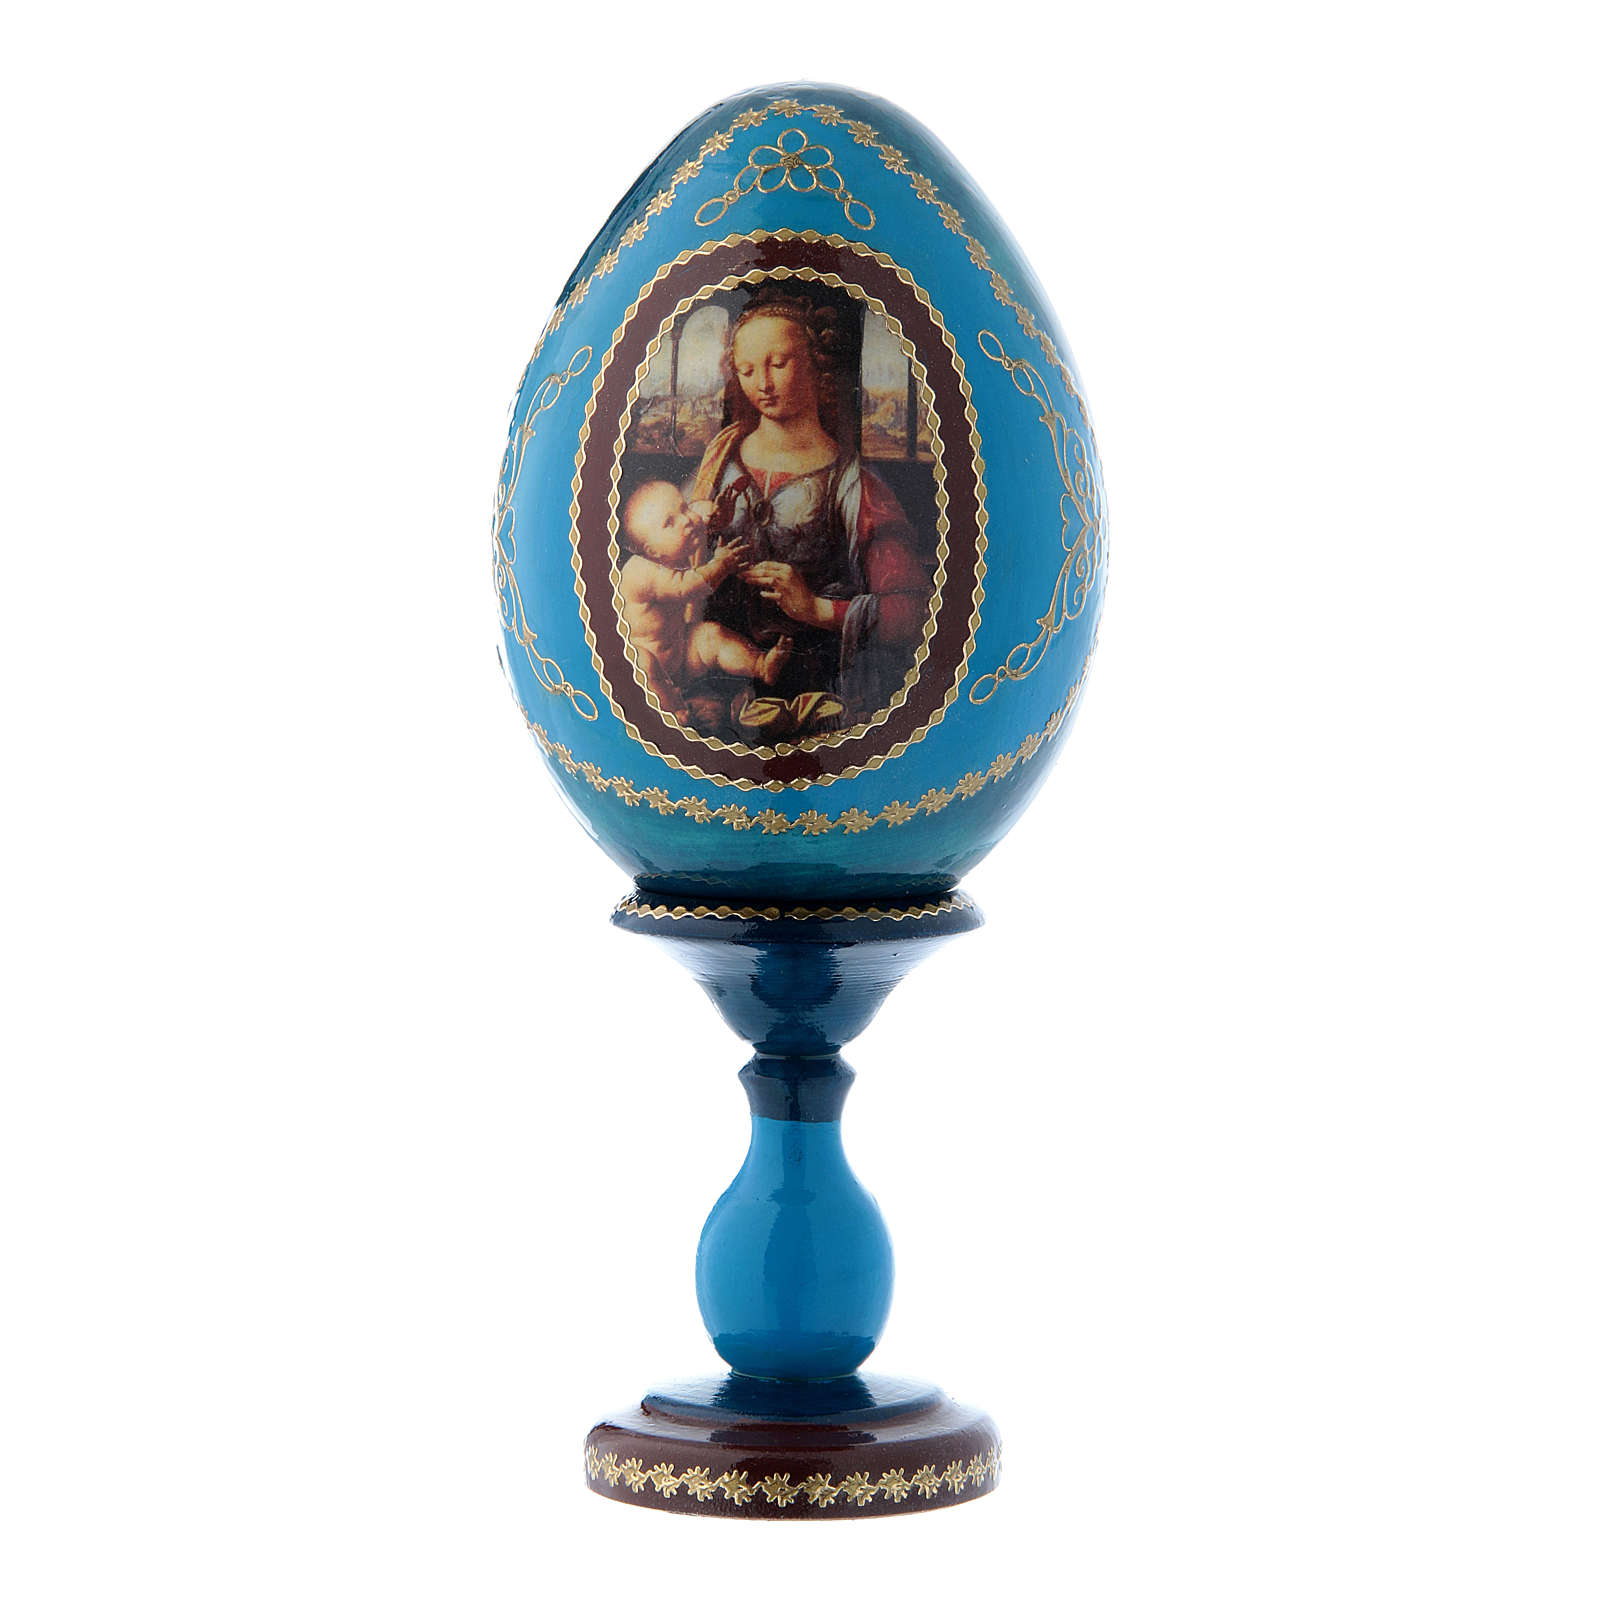 Huevo ruso azul Virgen con Niño decorado Fabergé h tot 16 cm 4